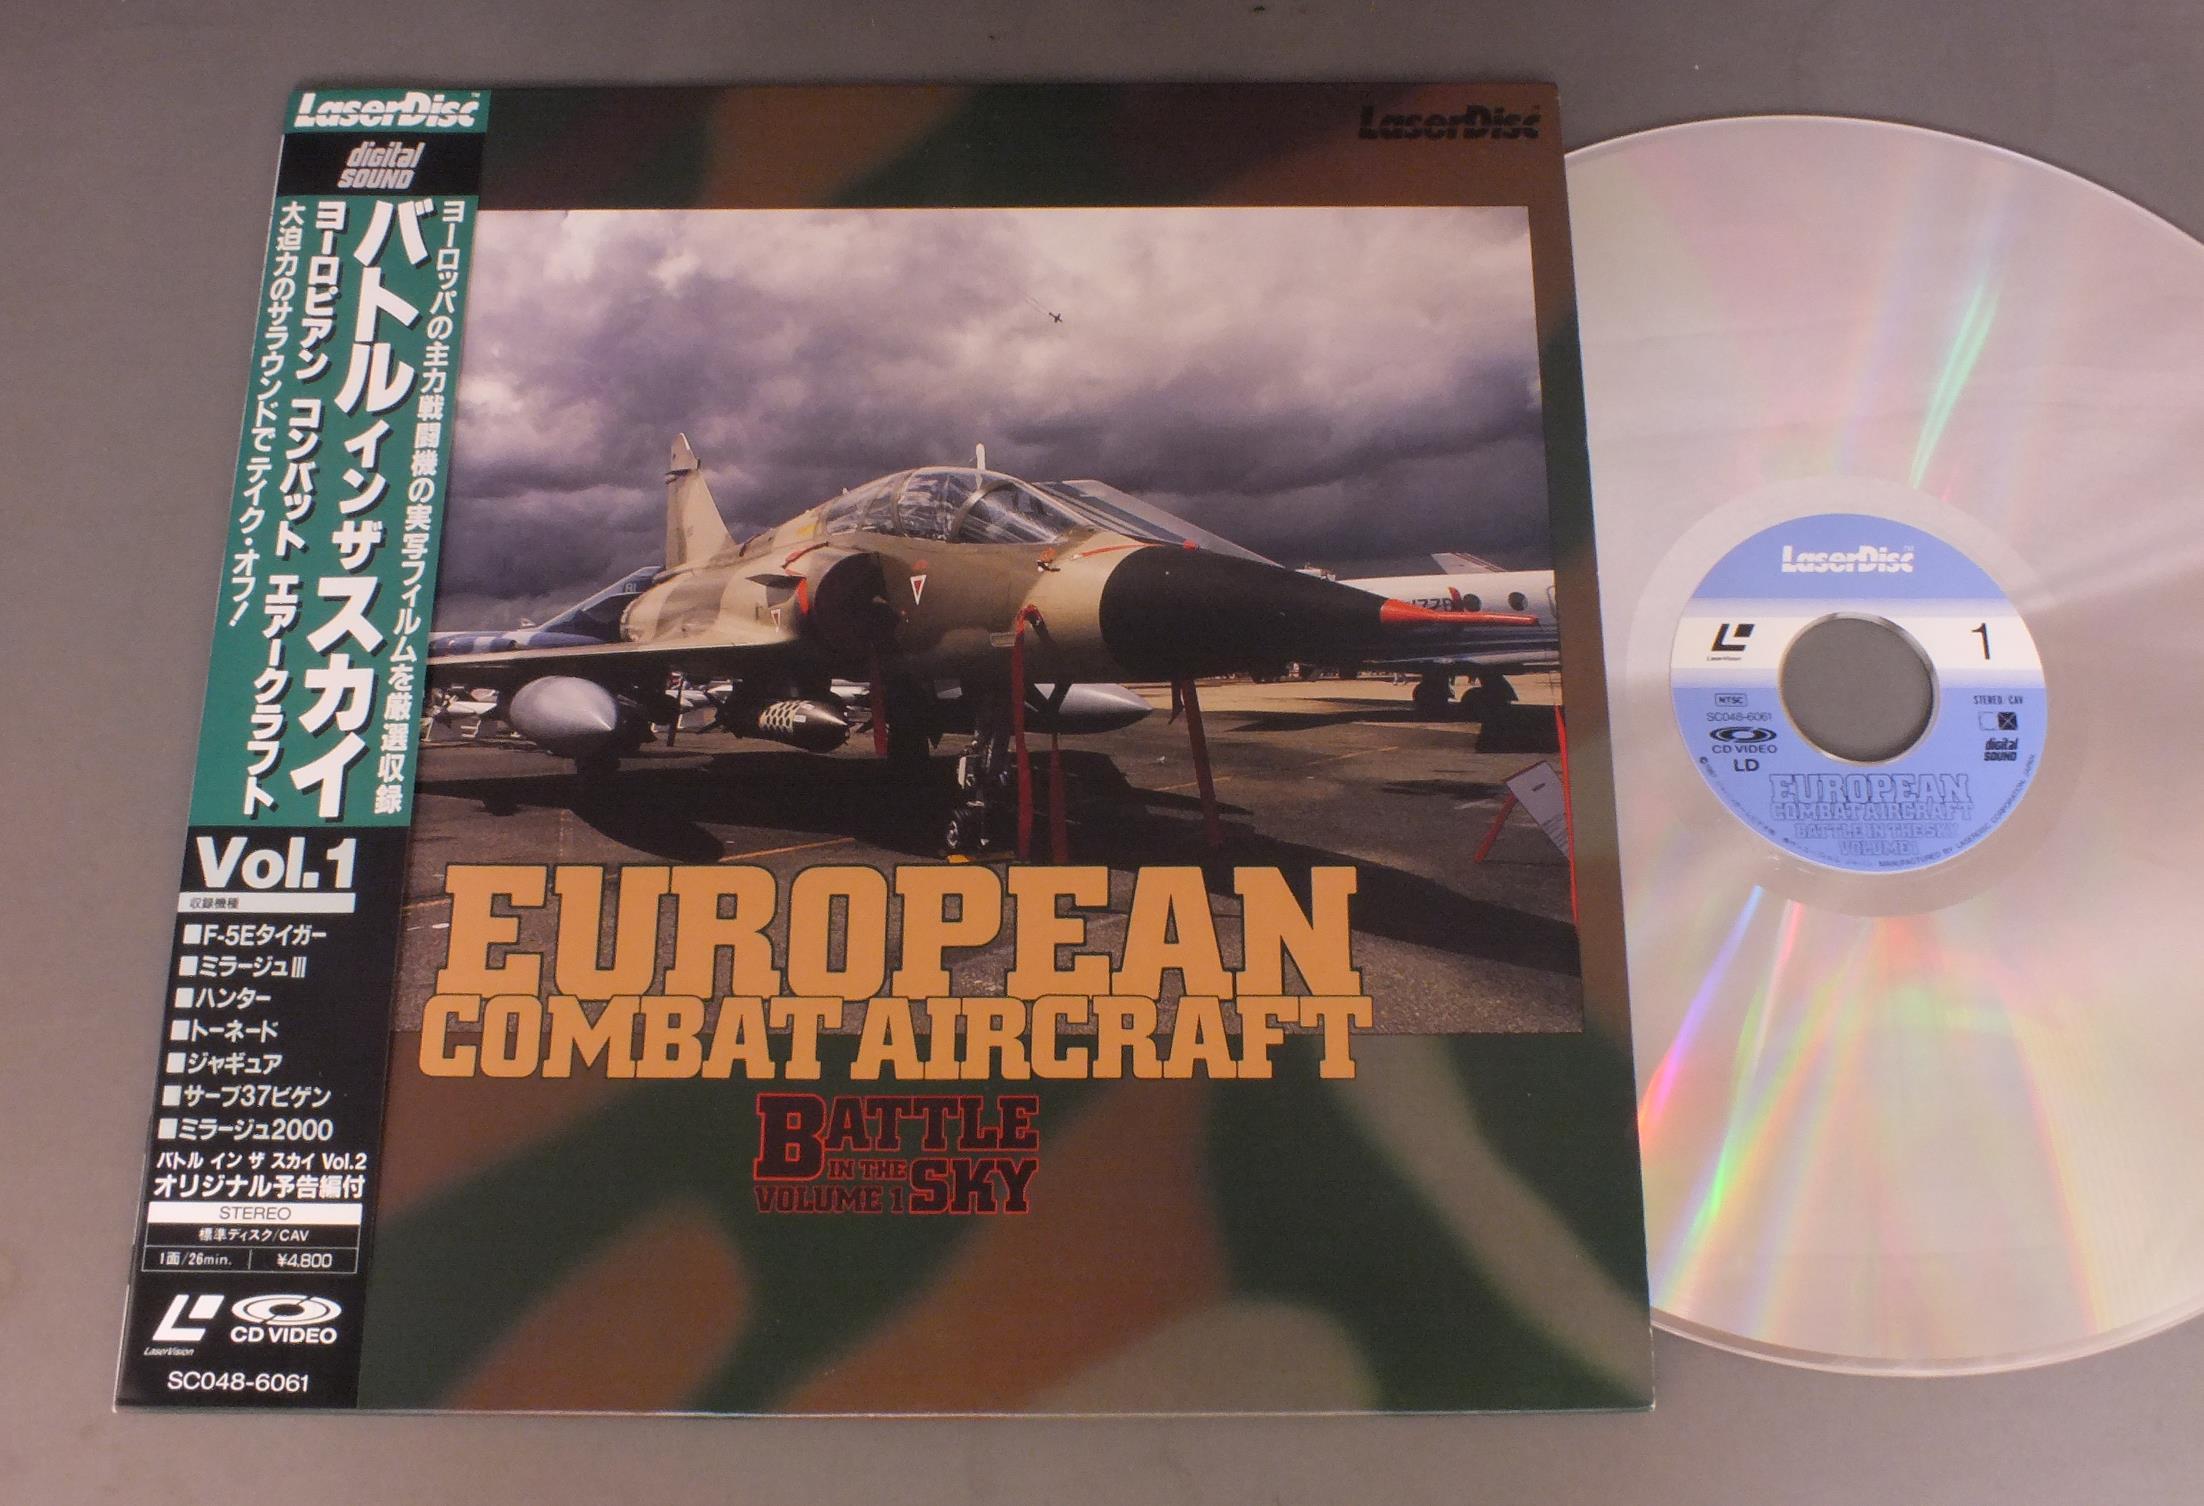 EUROPEAN COMBAT AIRCRAFT - BATTLE IN THE SKY VOL1 - Laser Disc